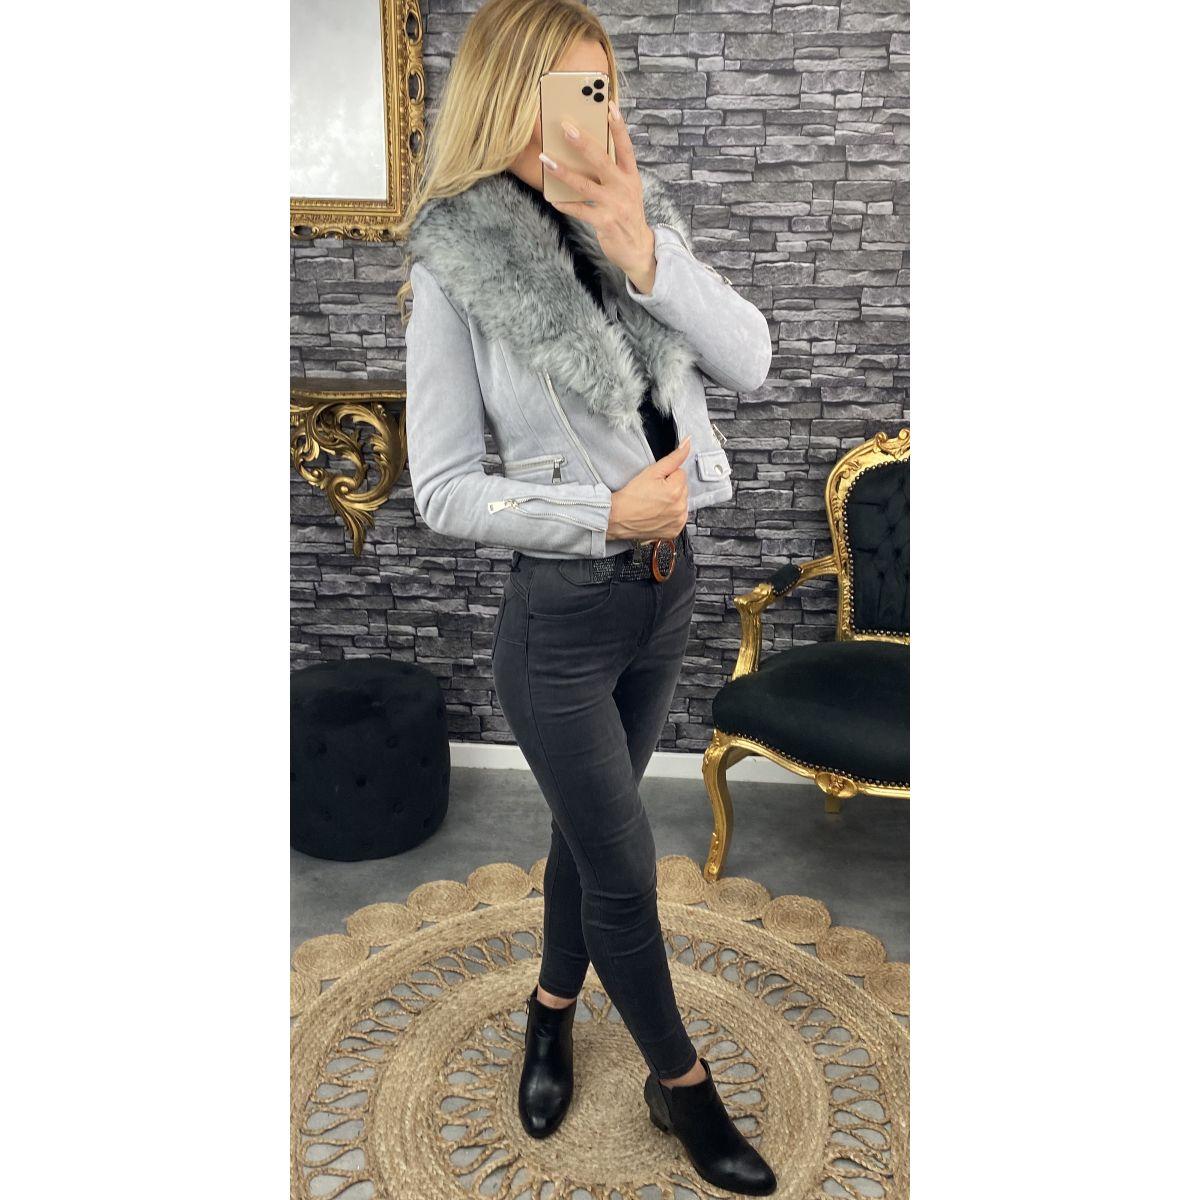 Perfecto style daim gris...